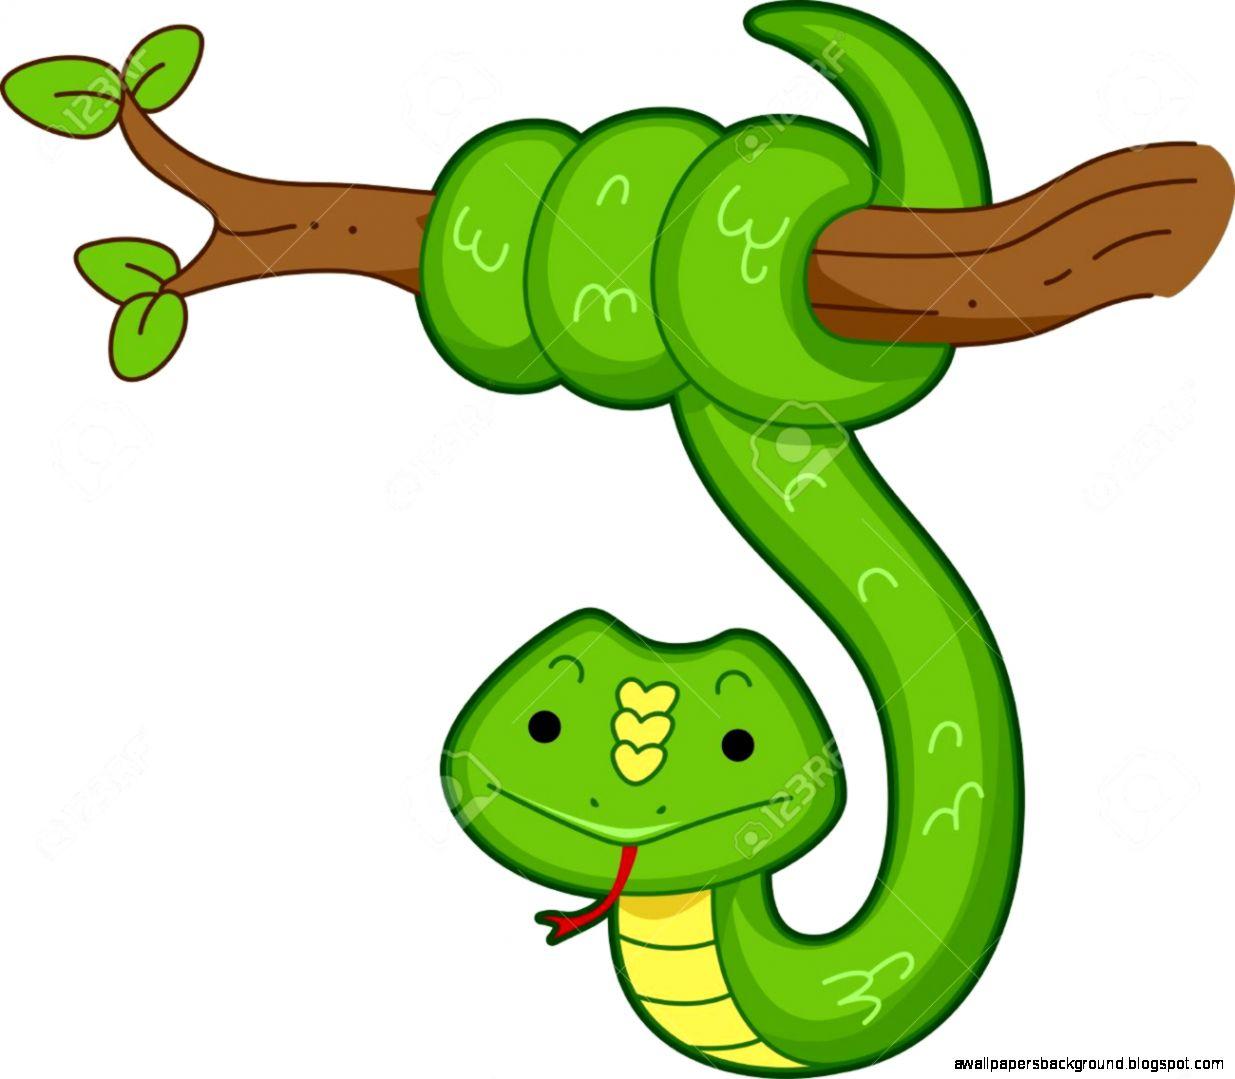 Snake clipart. Jokingart com download free